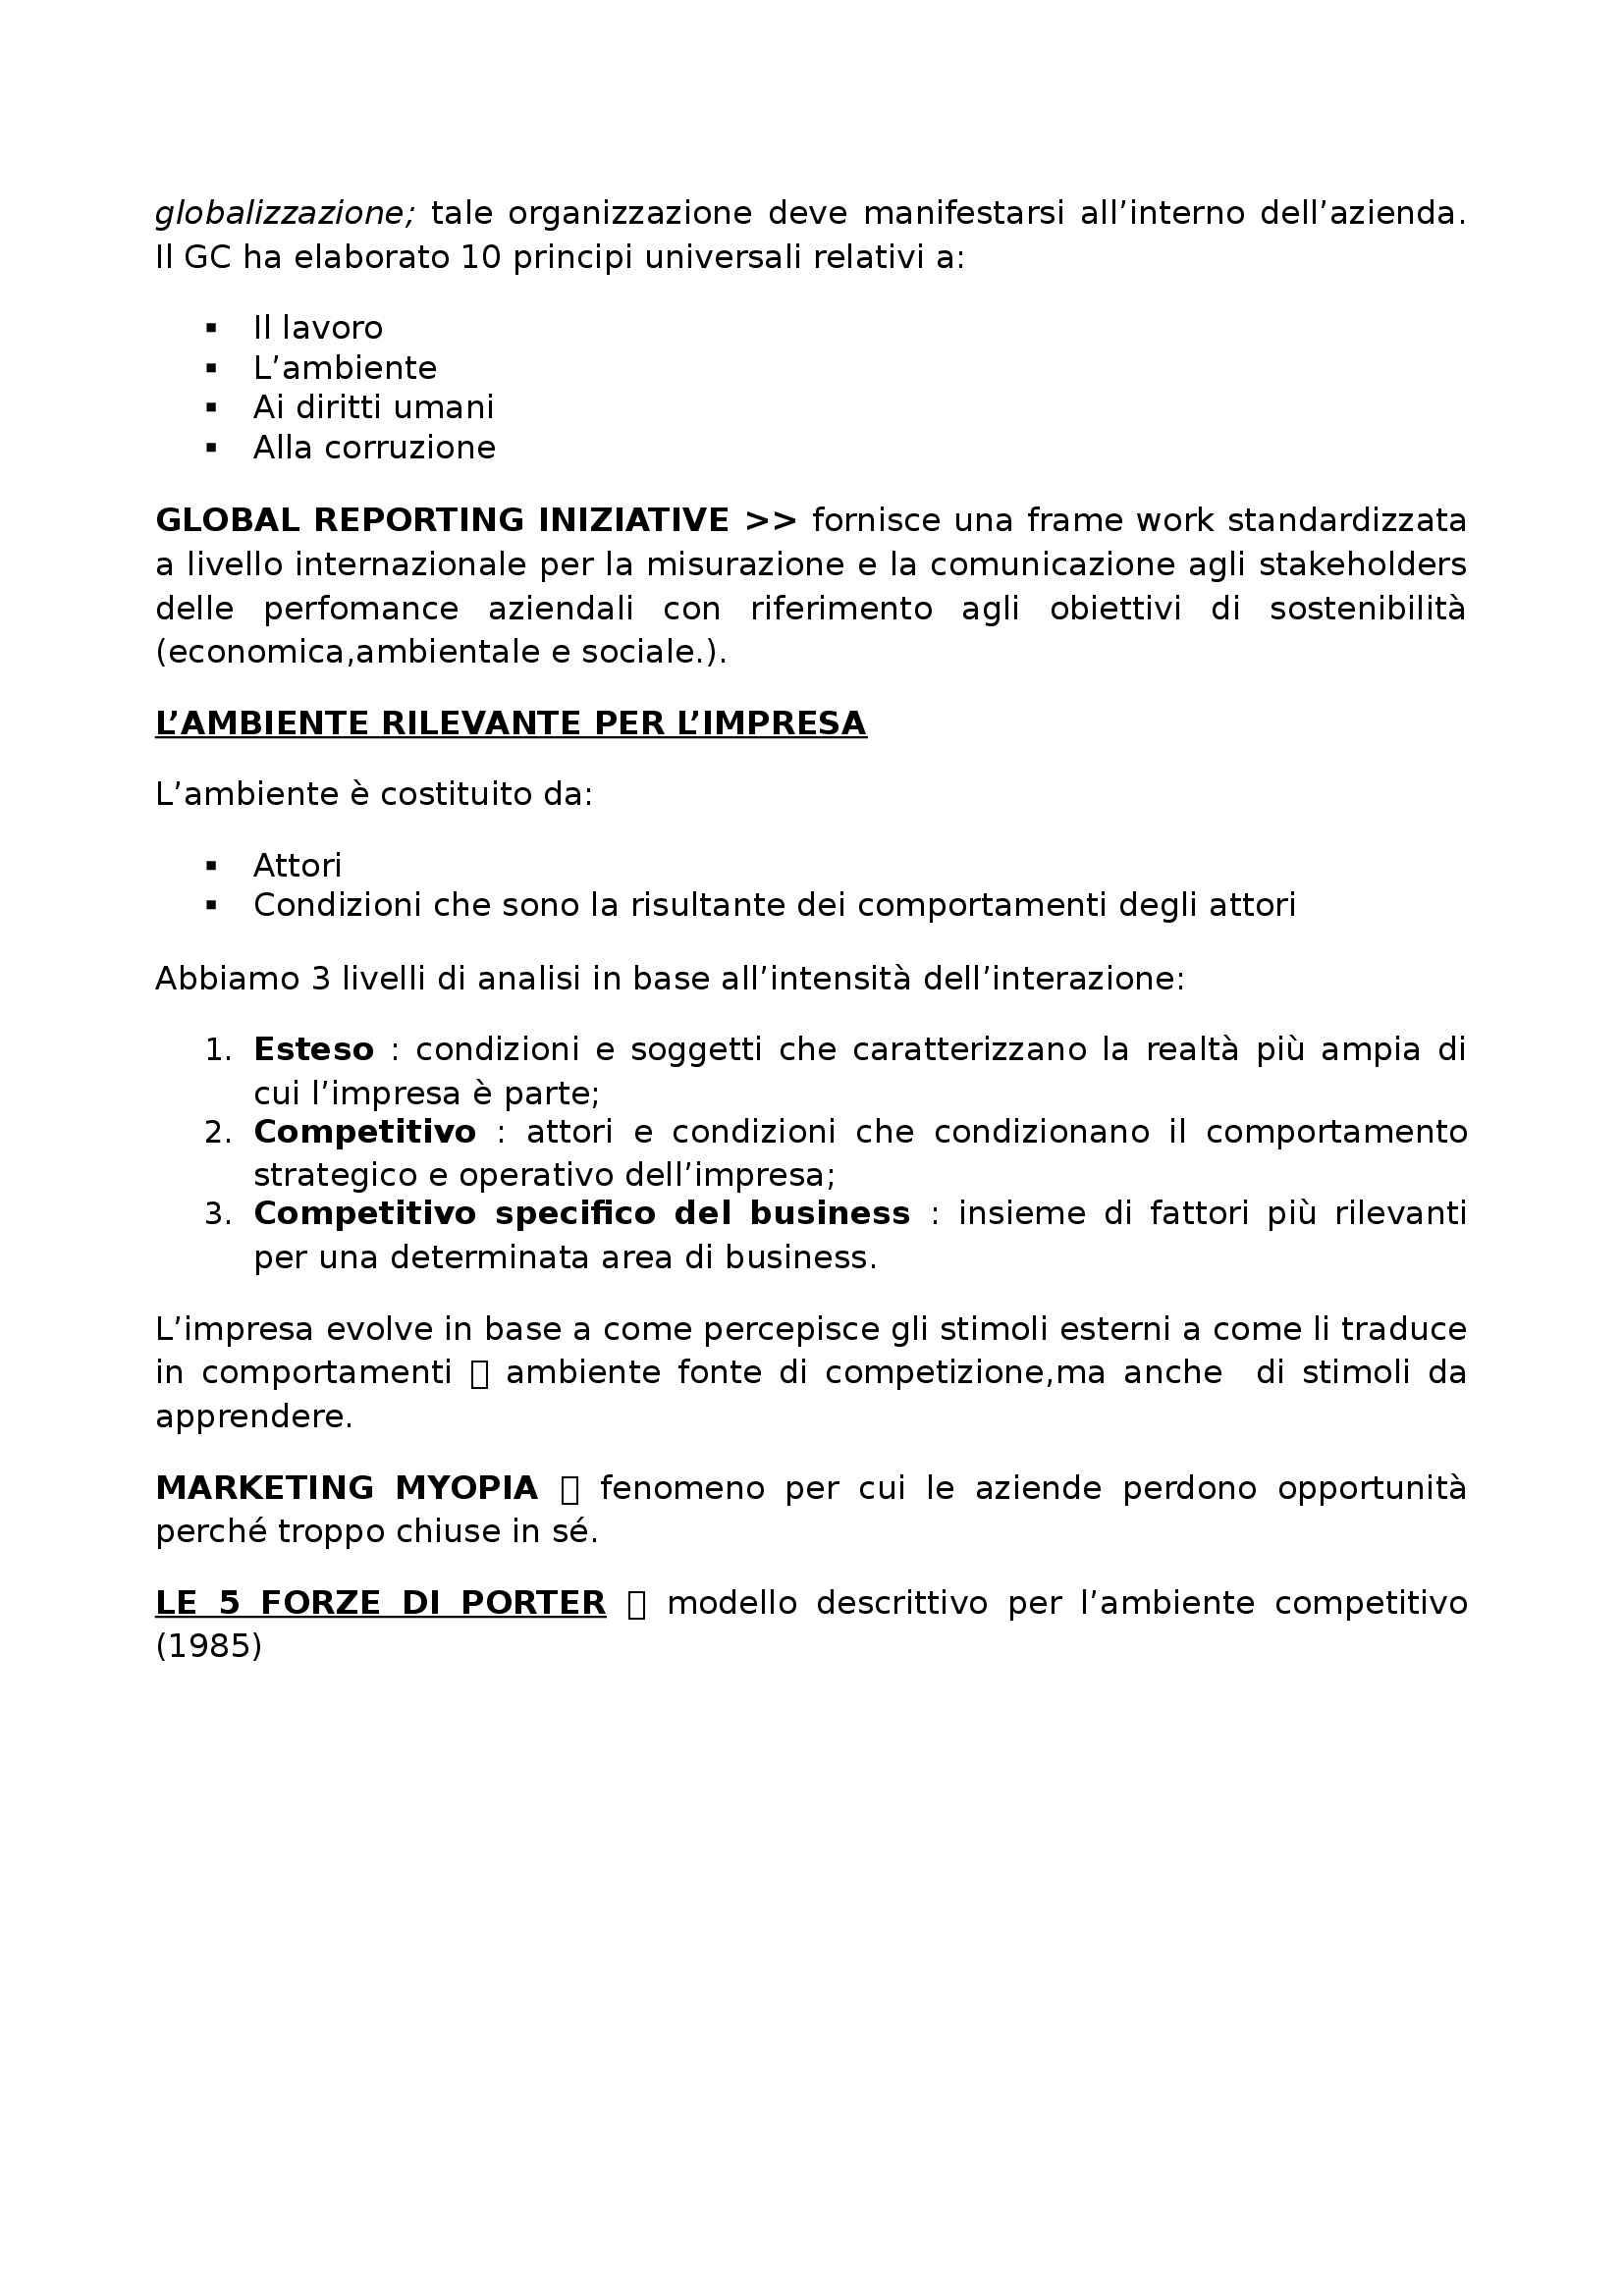 Fondamenti di management - management Pag. 2